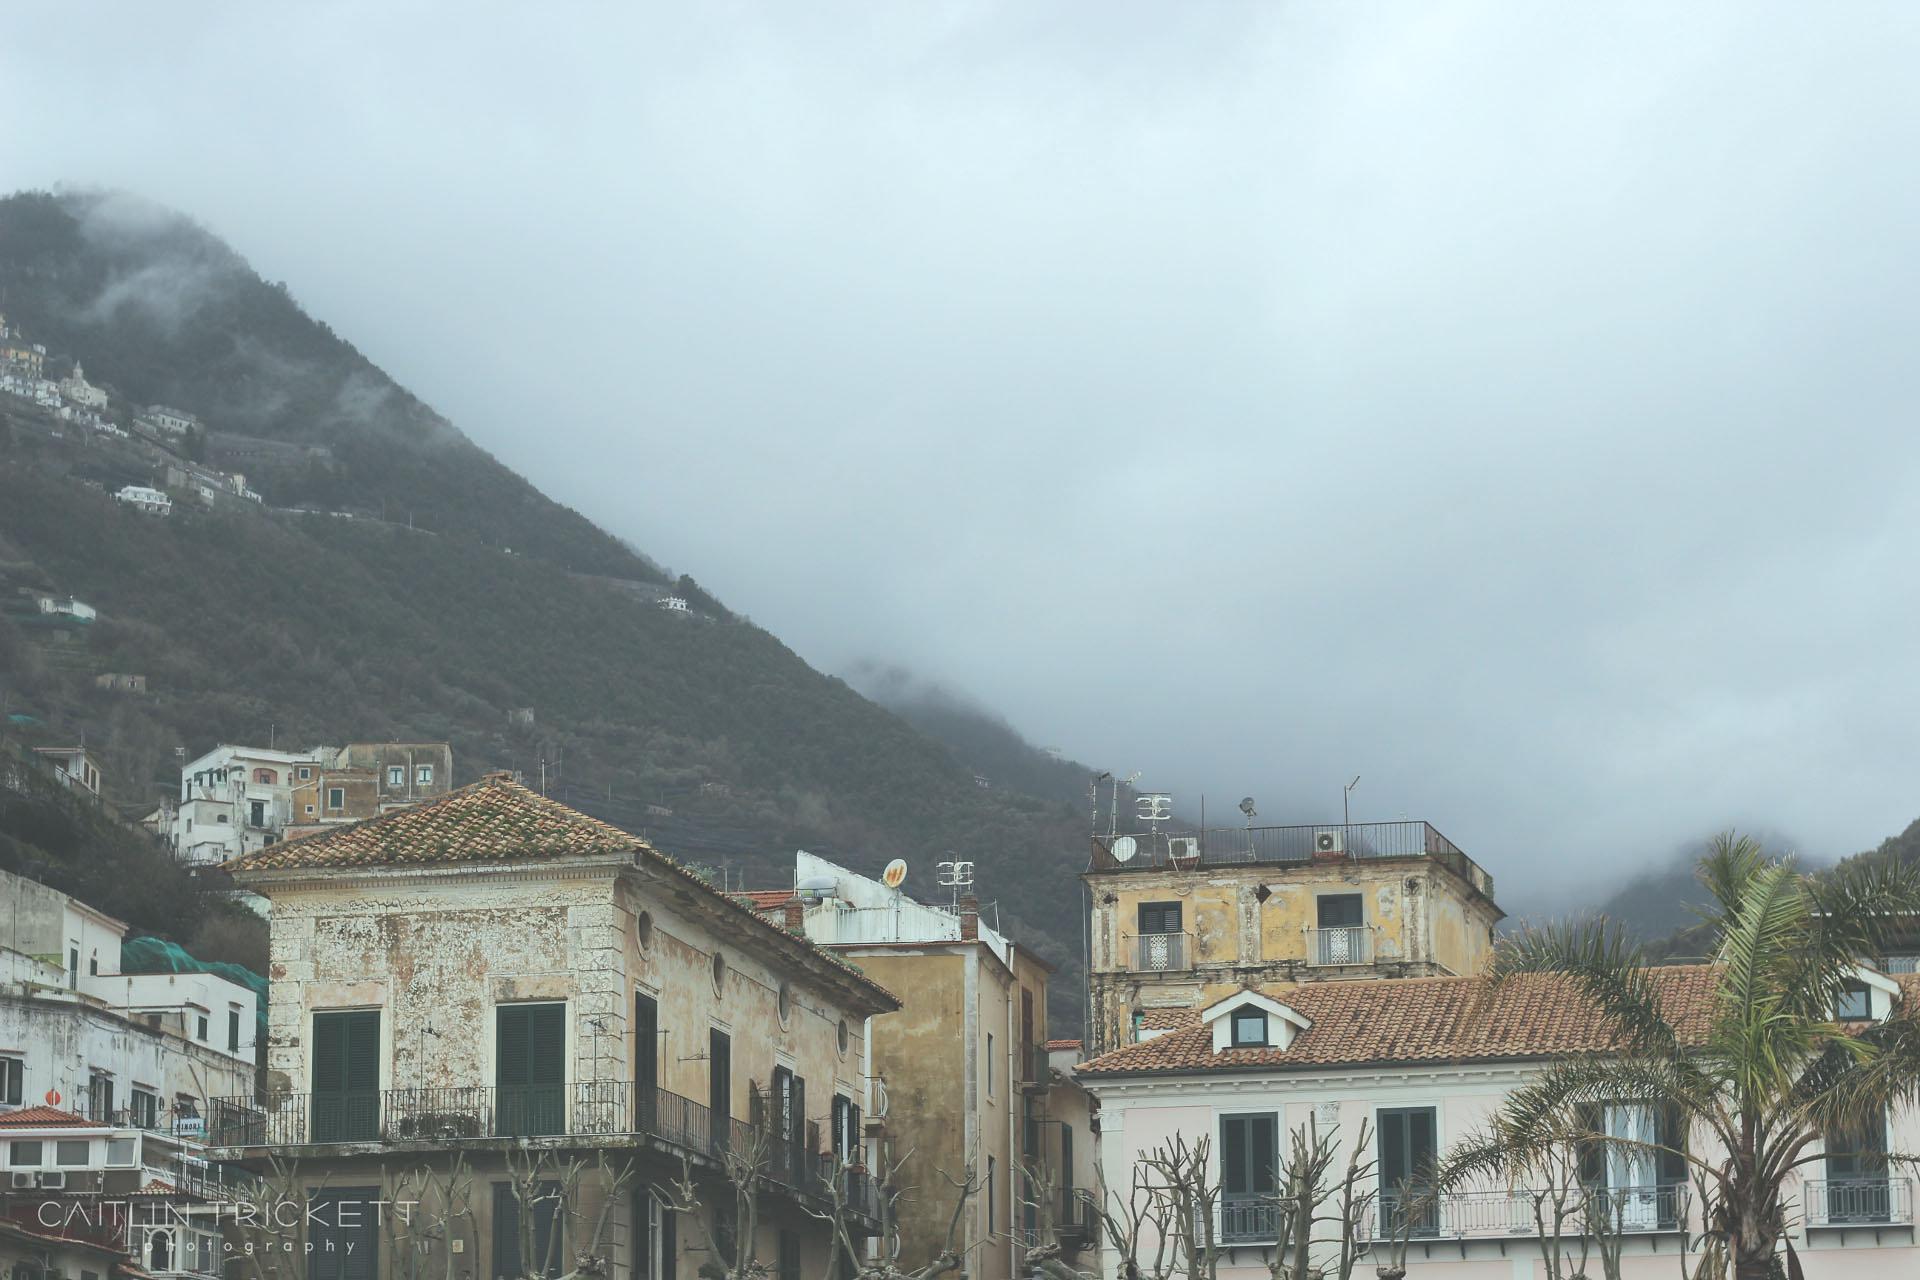 Minori,Italy (from the Mediterranean Sea)